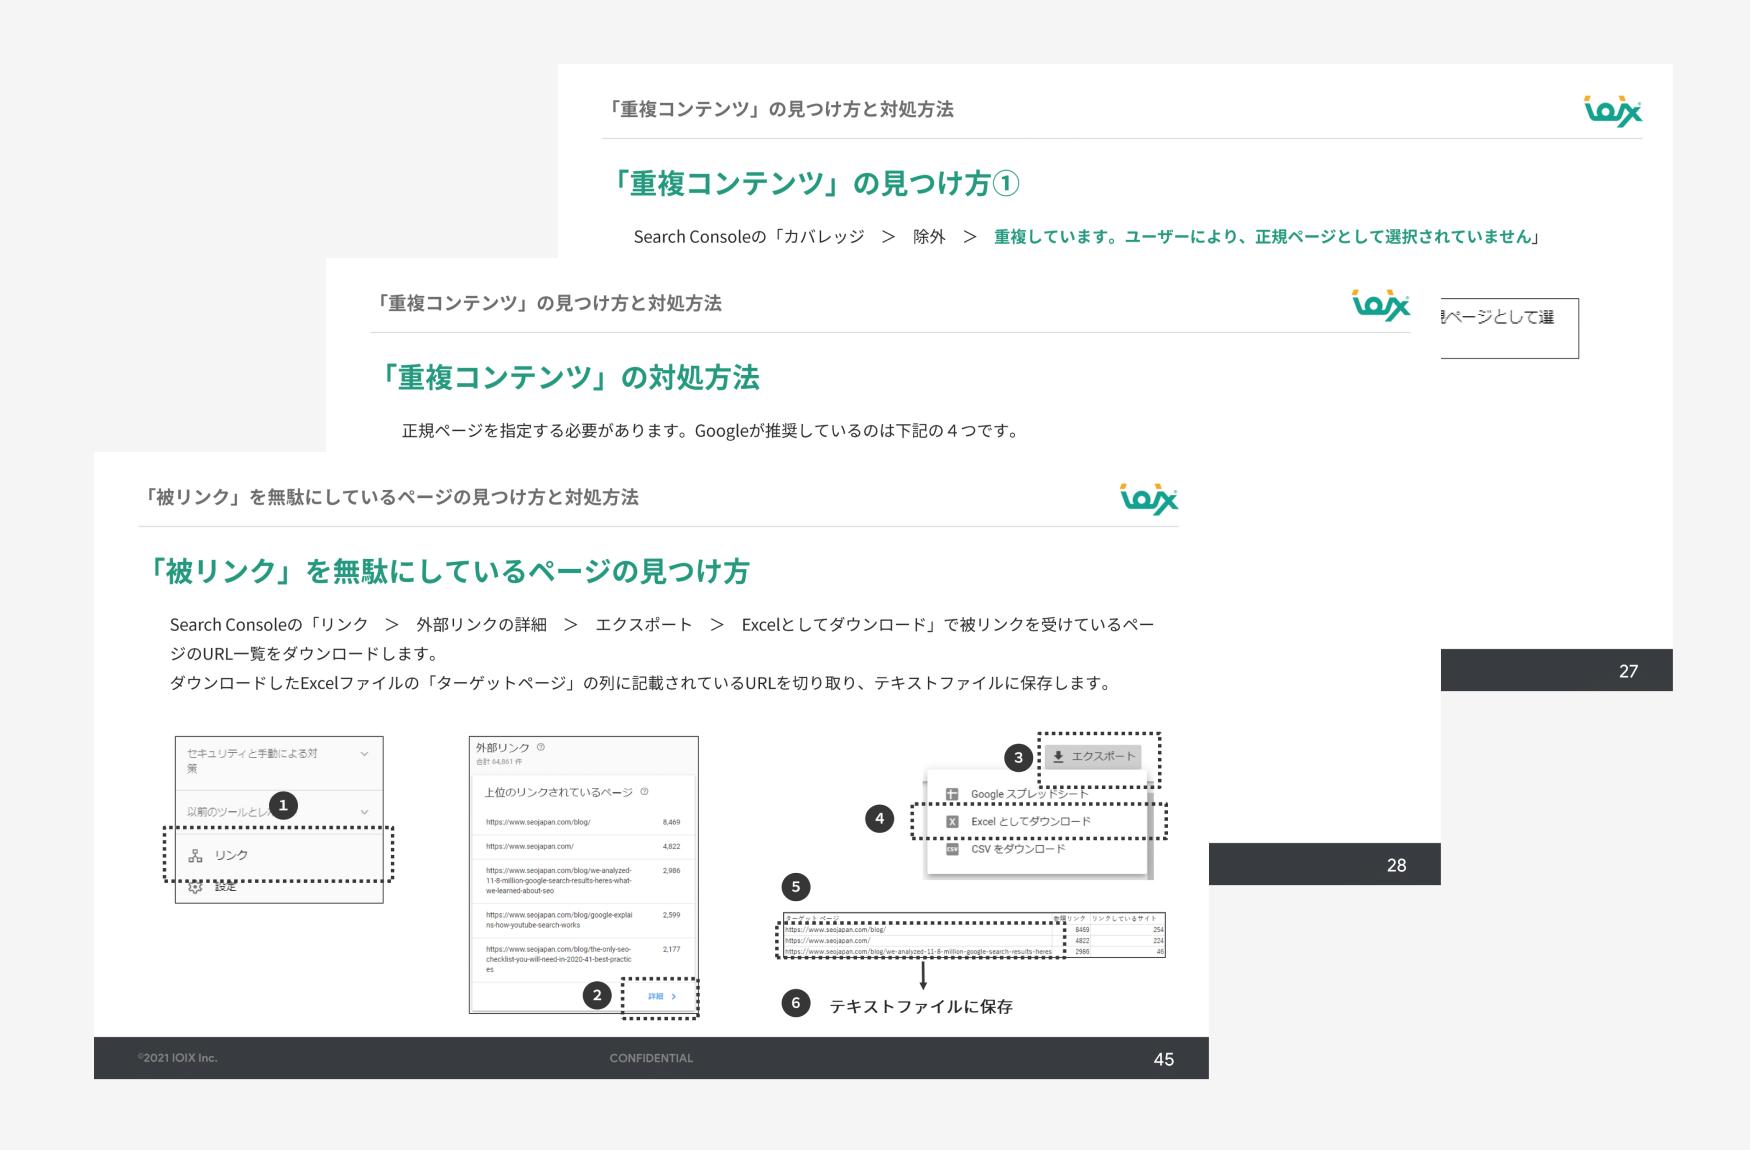 Google Search Console 実践マニュアル